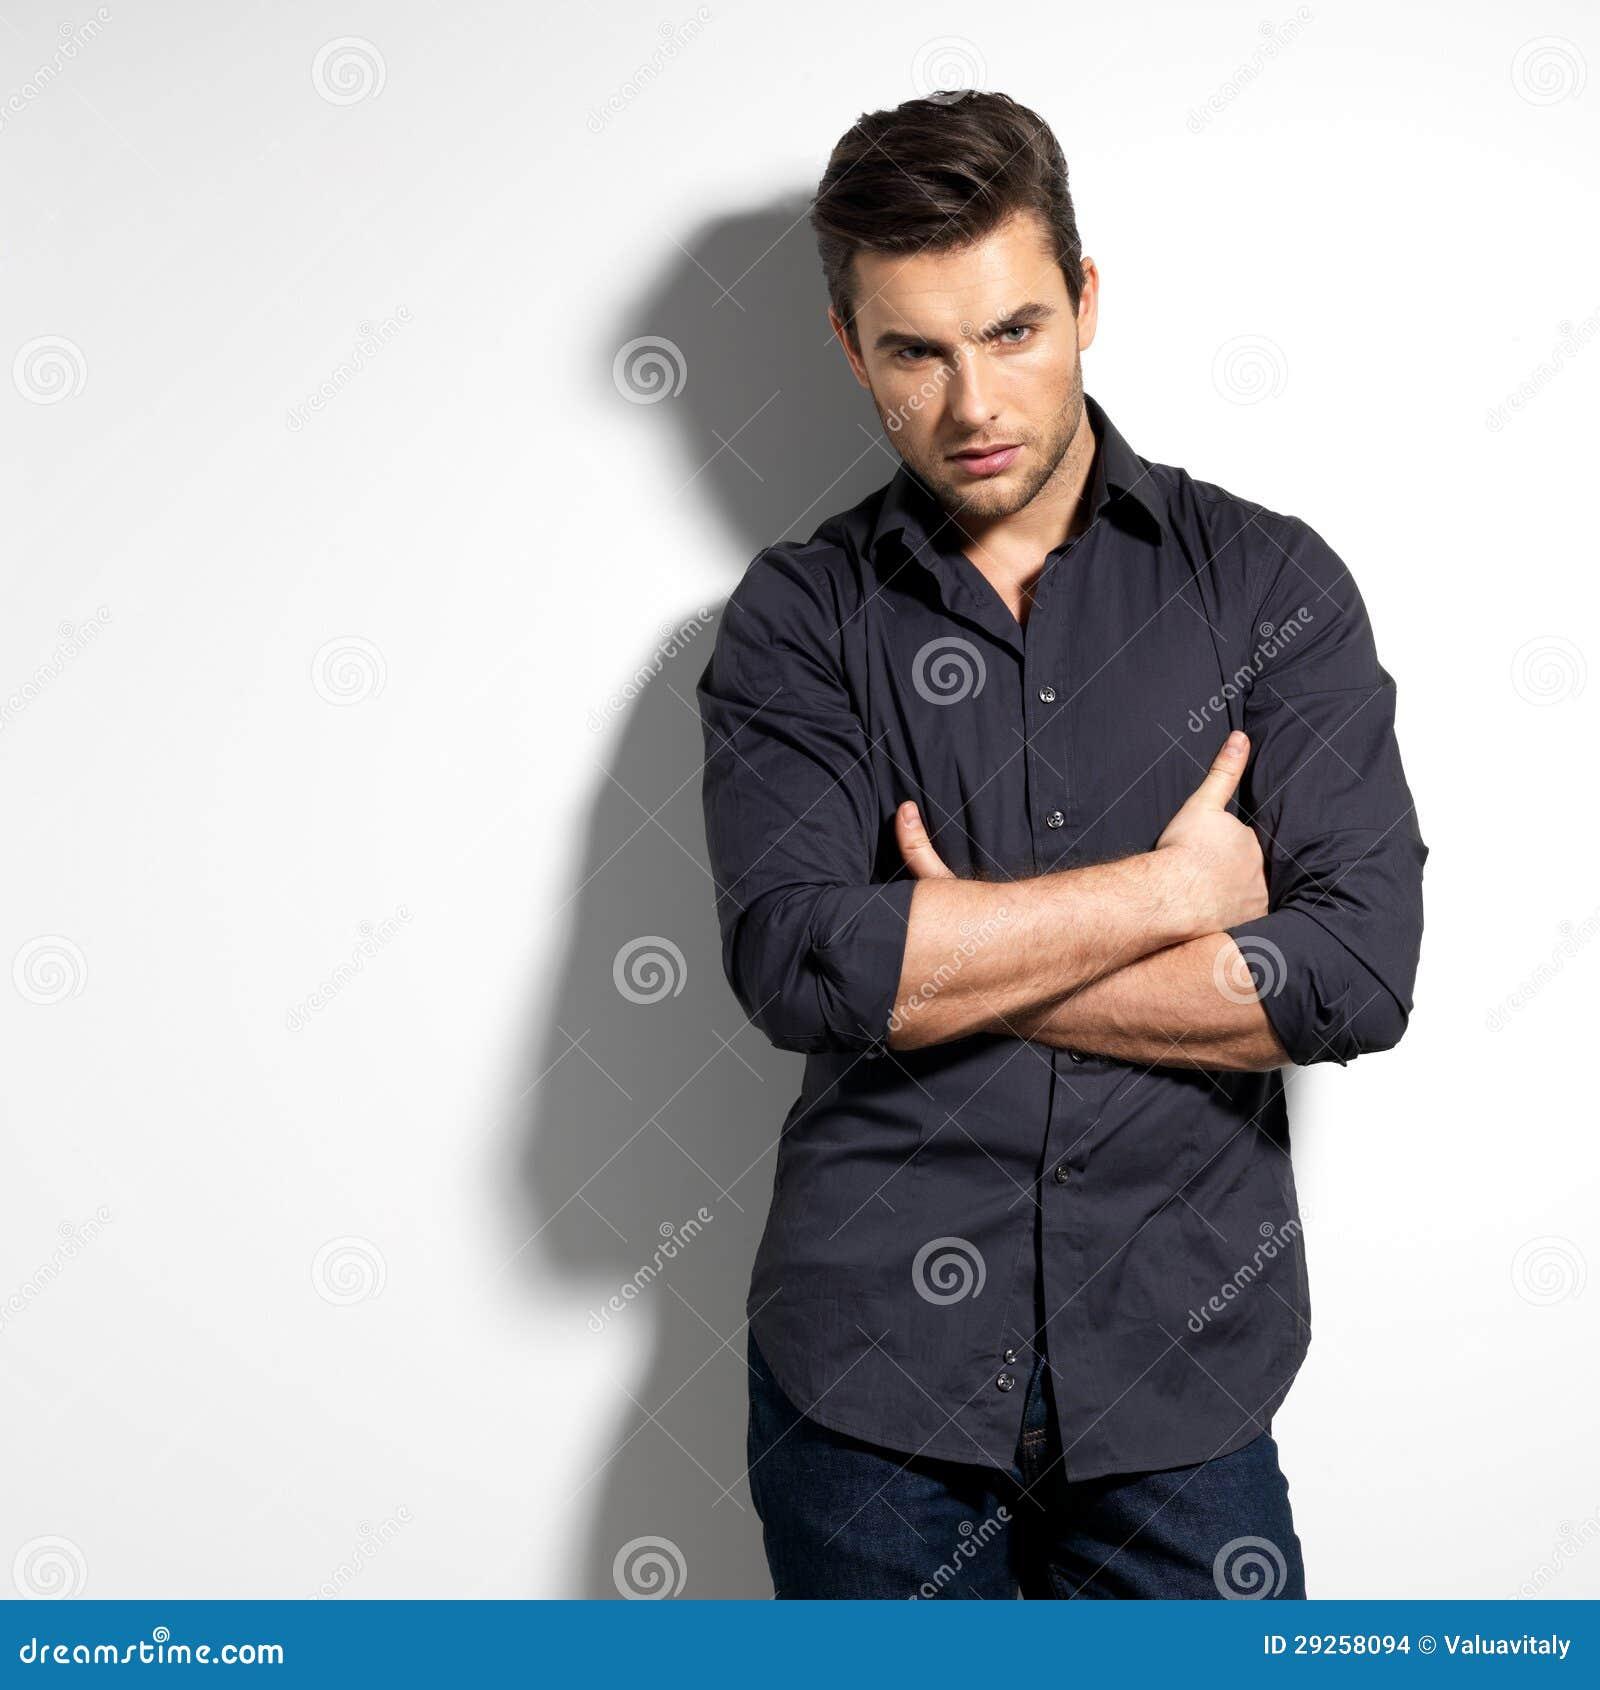 Fashion Portrait Young Man Black Shirt Stock Photos, Images ...